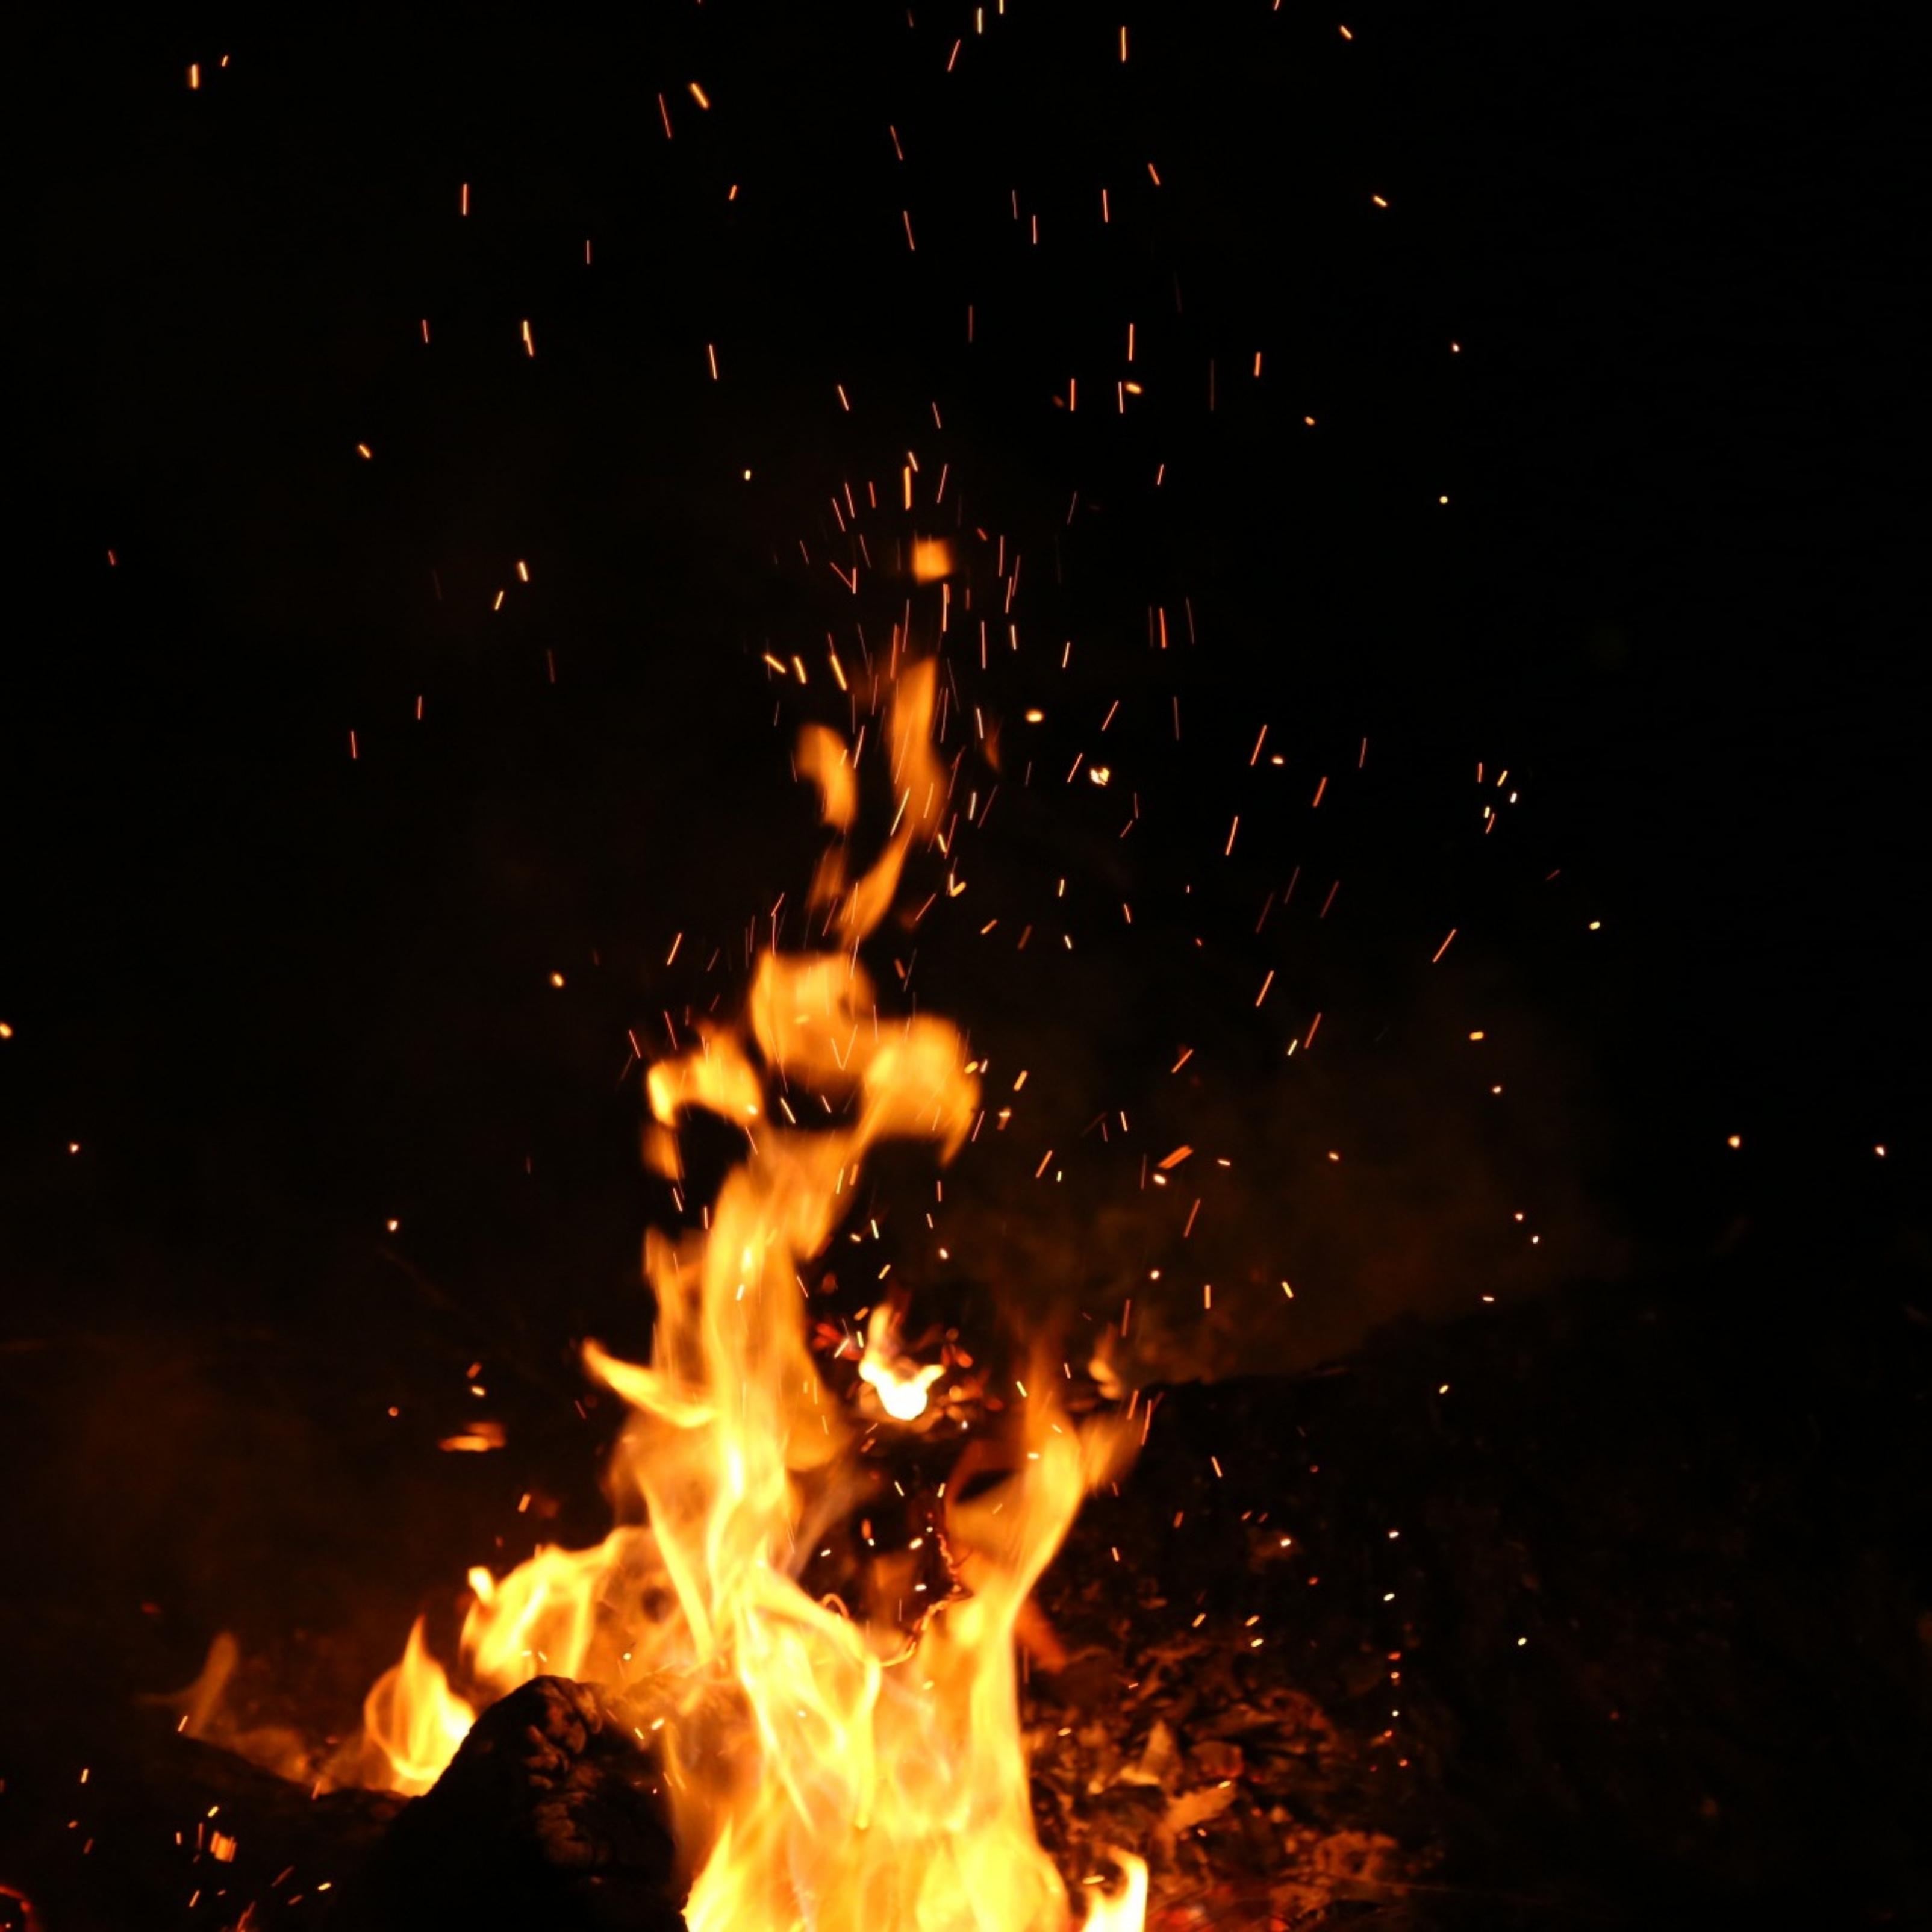 Burning Flame Dark Fire Background iPad Wallpaper